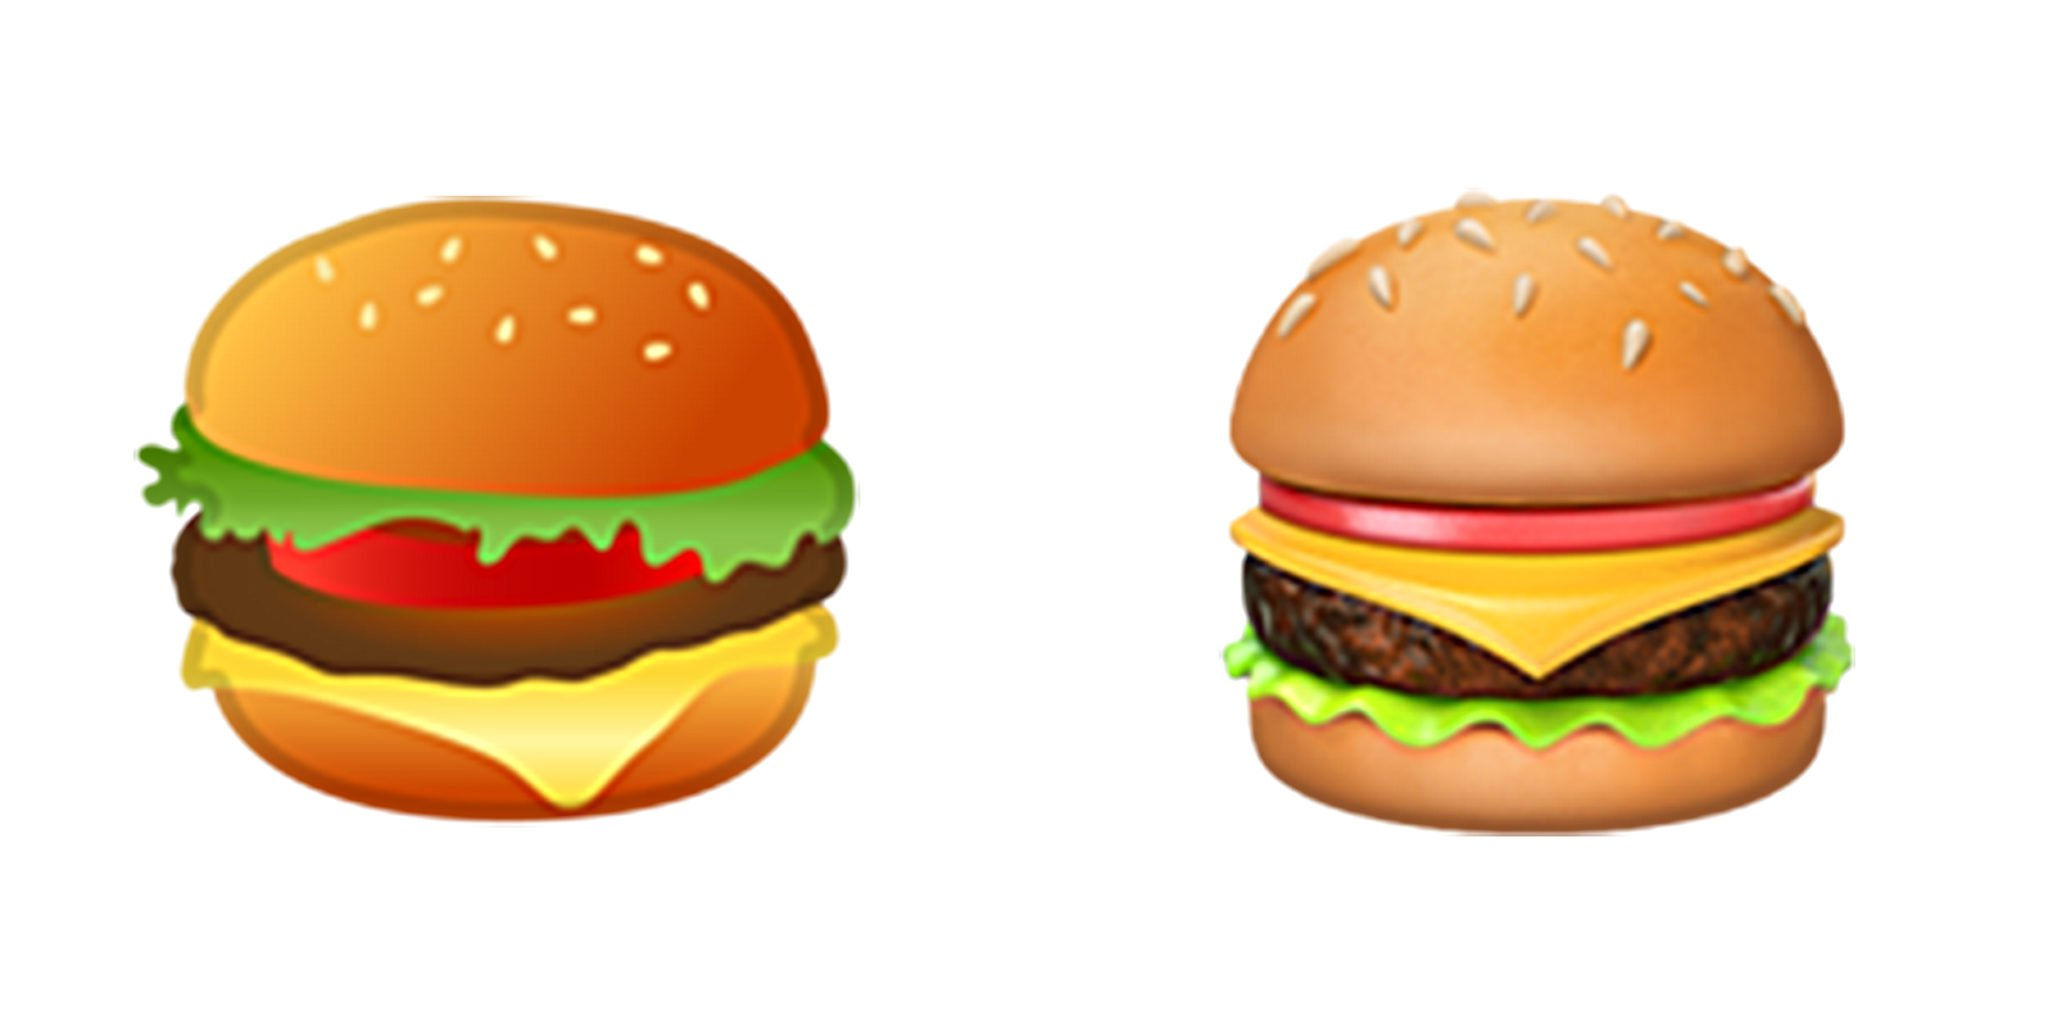 Burger clipart emoji. Forget smartphones apple and